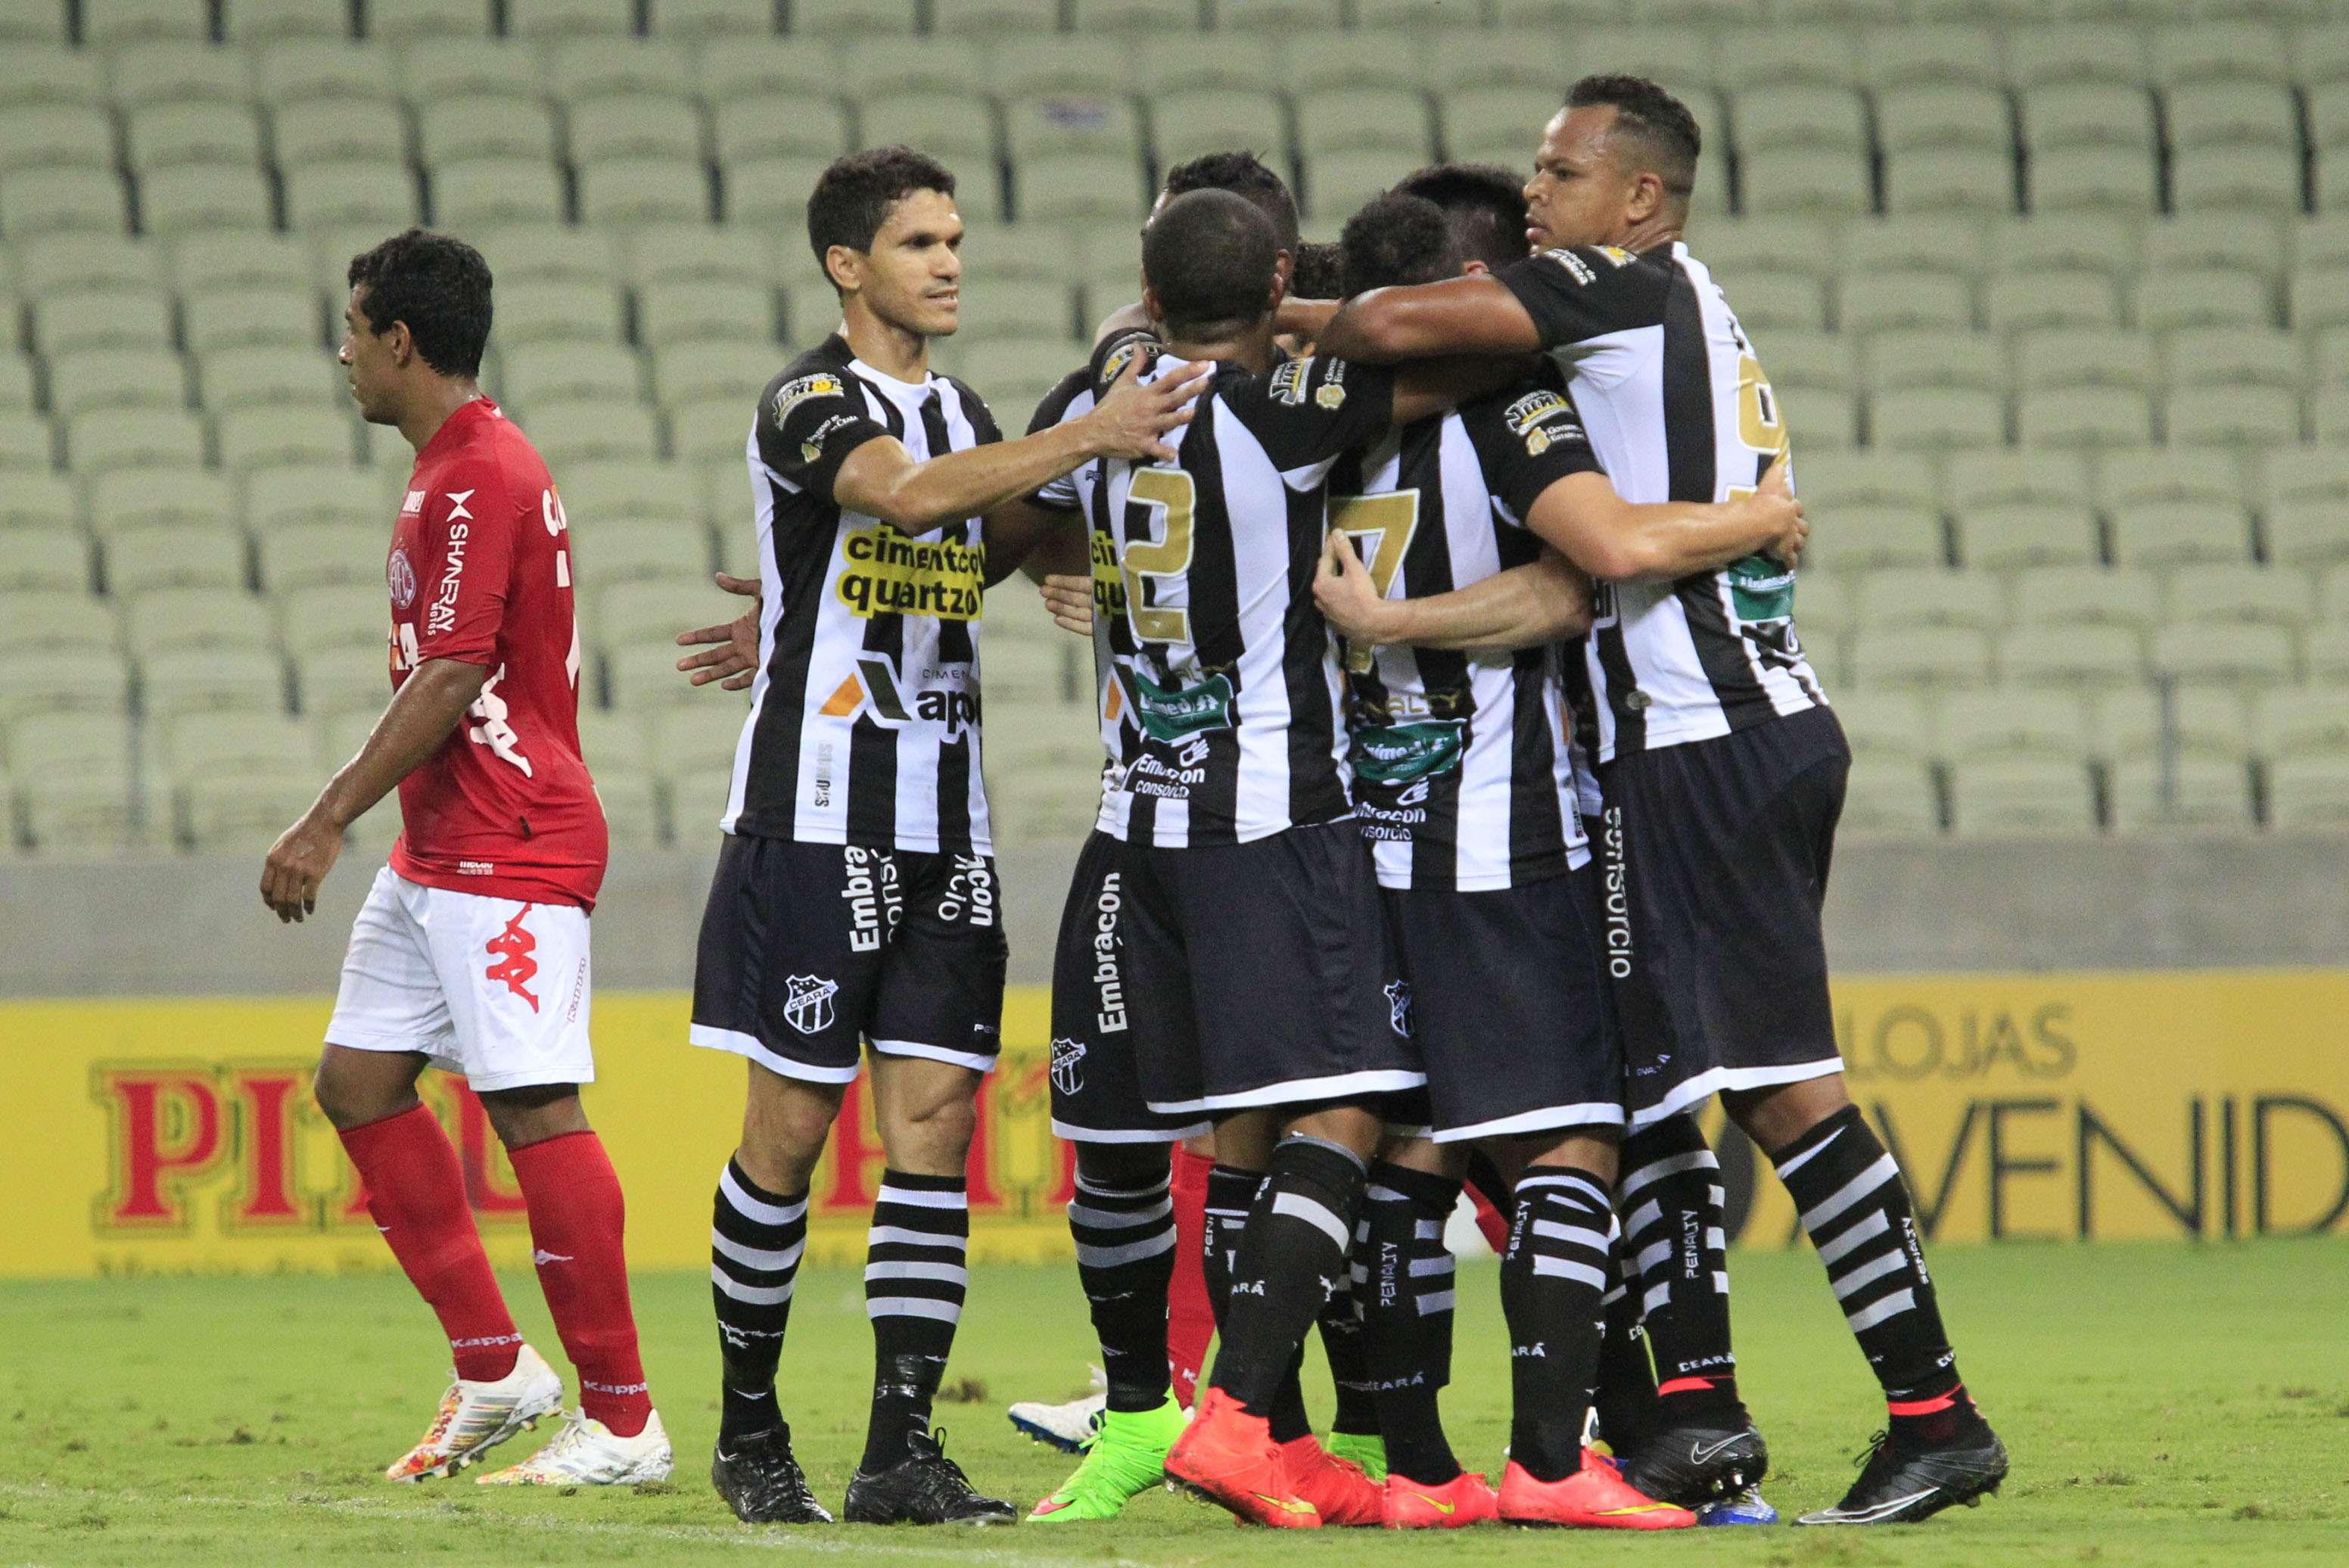 Ceará se recuperou após resultados ruins Foto: LC Moreira/Agência Lance